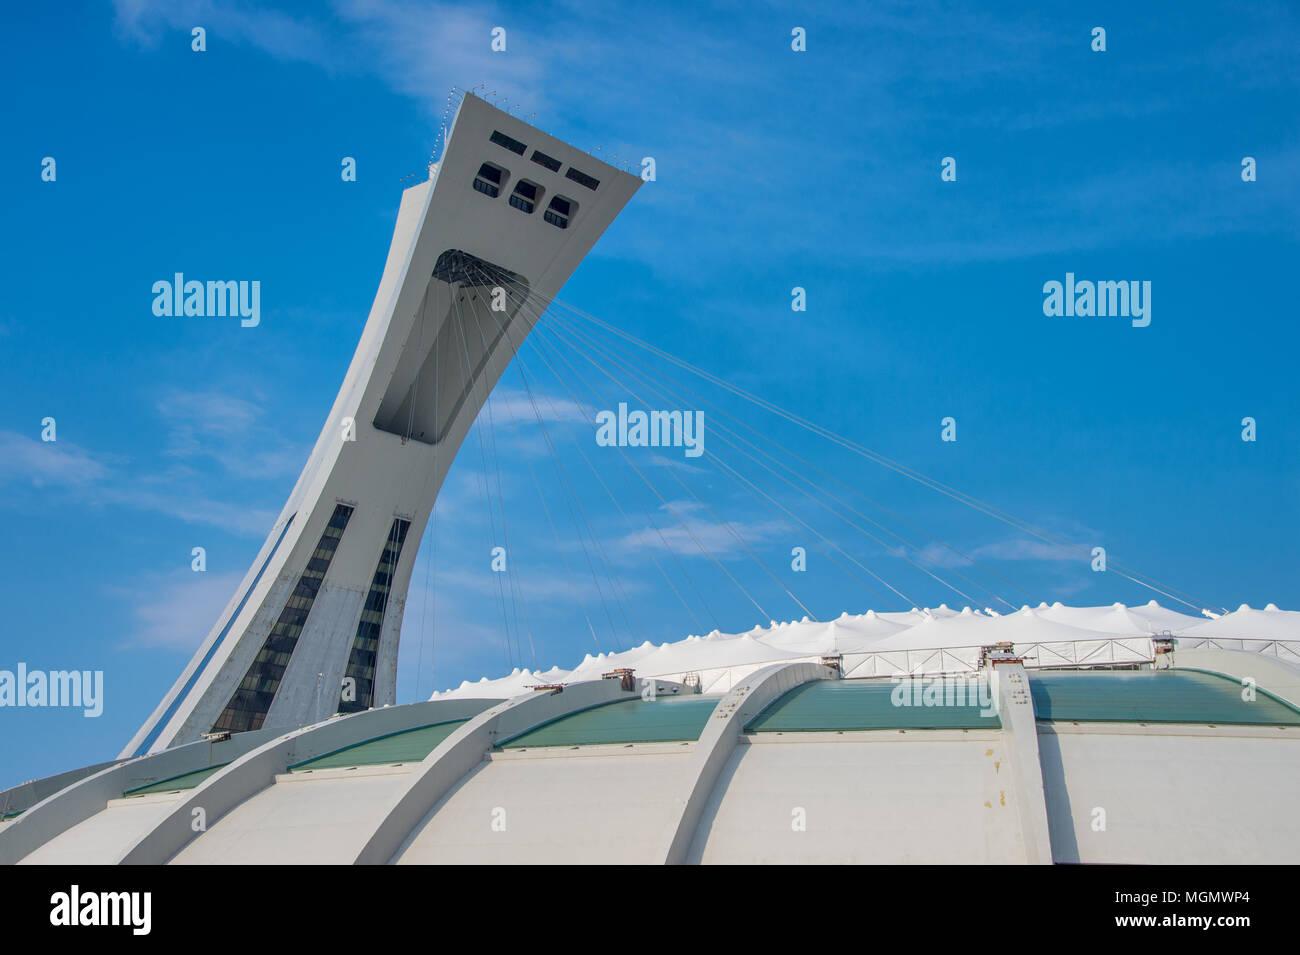 Montreal, CA - 28. April 2018: Das Montrealer Olympiastadion und der Schiefe Turm. Stockbild